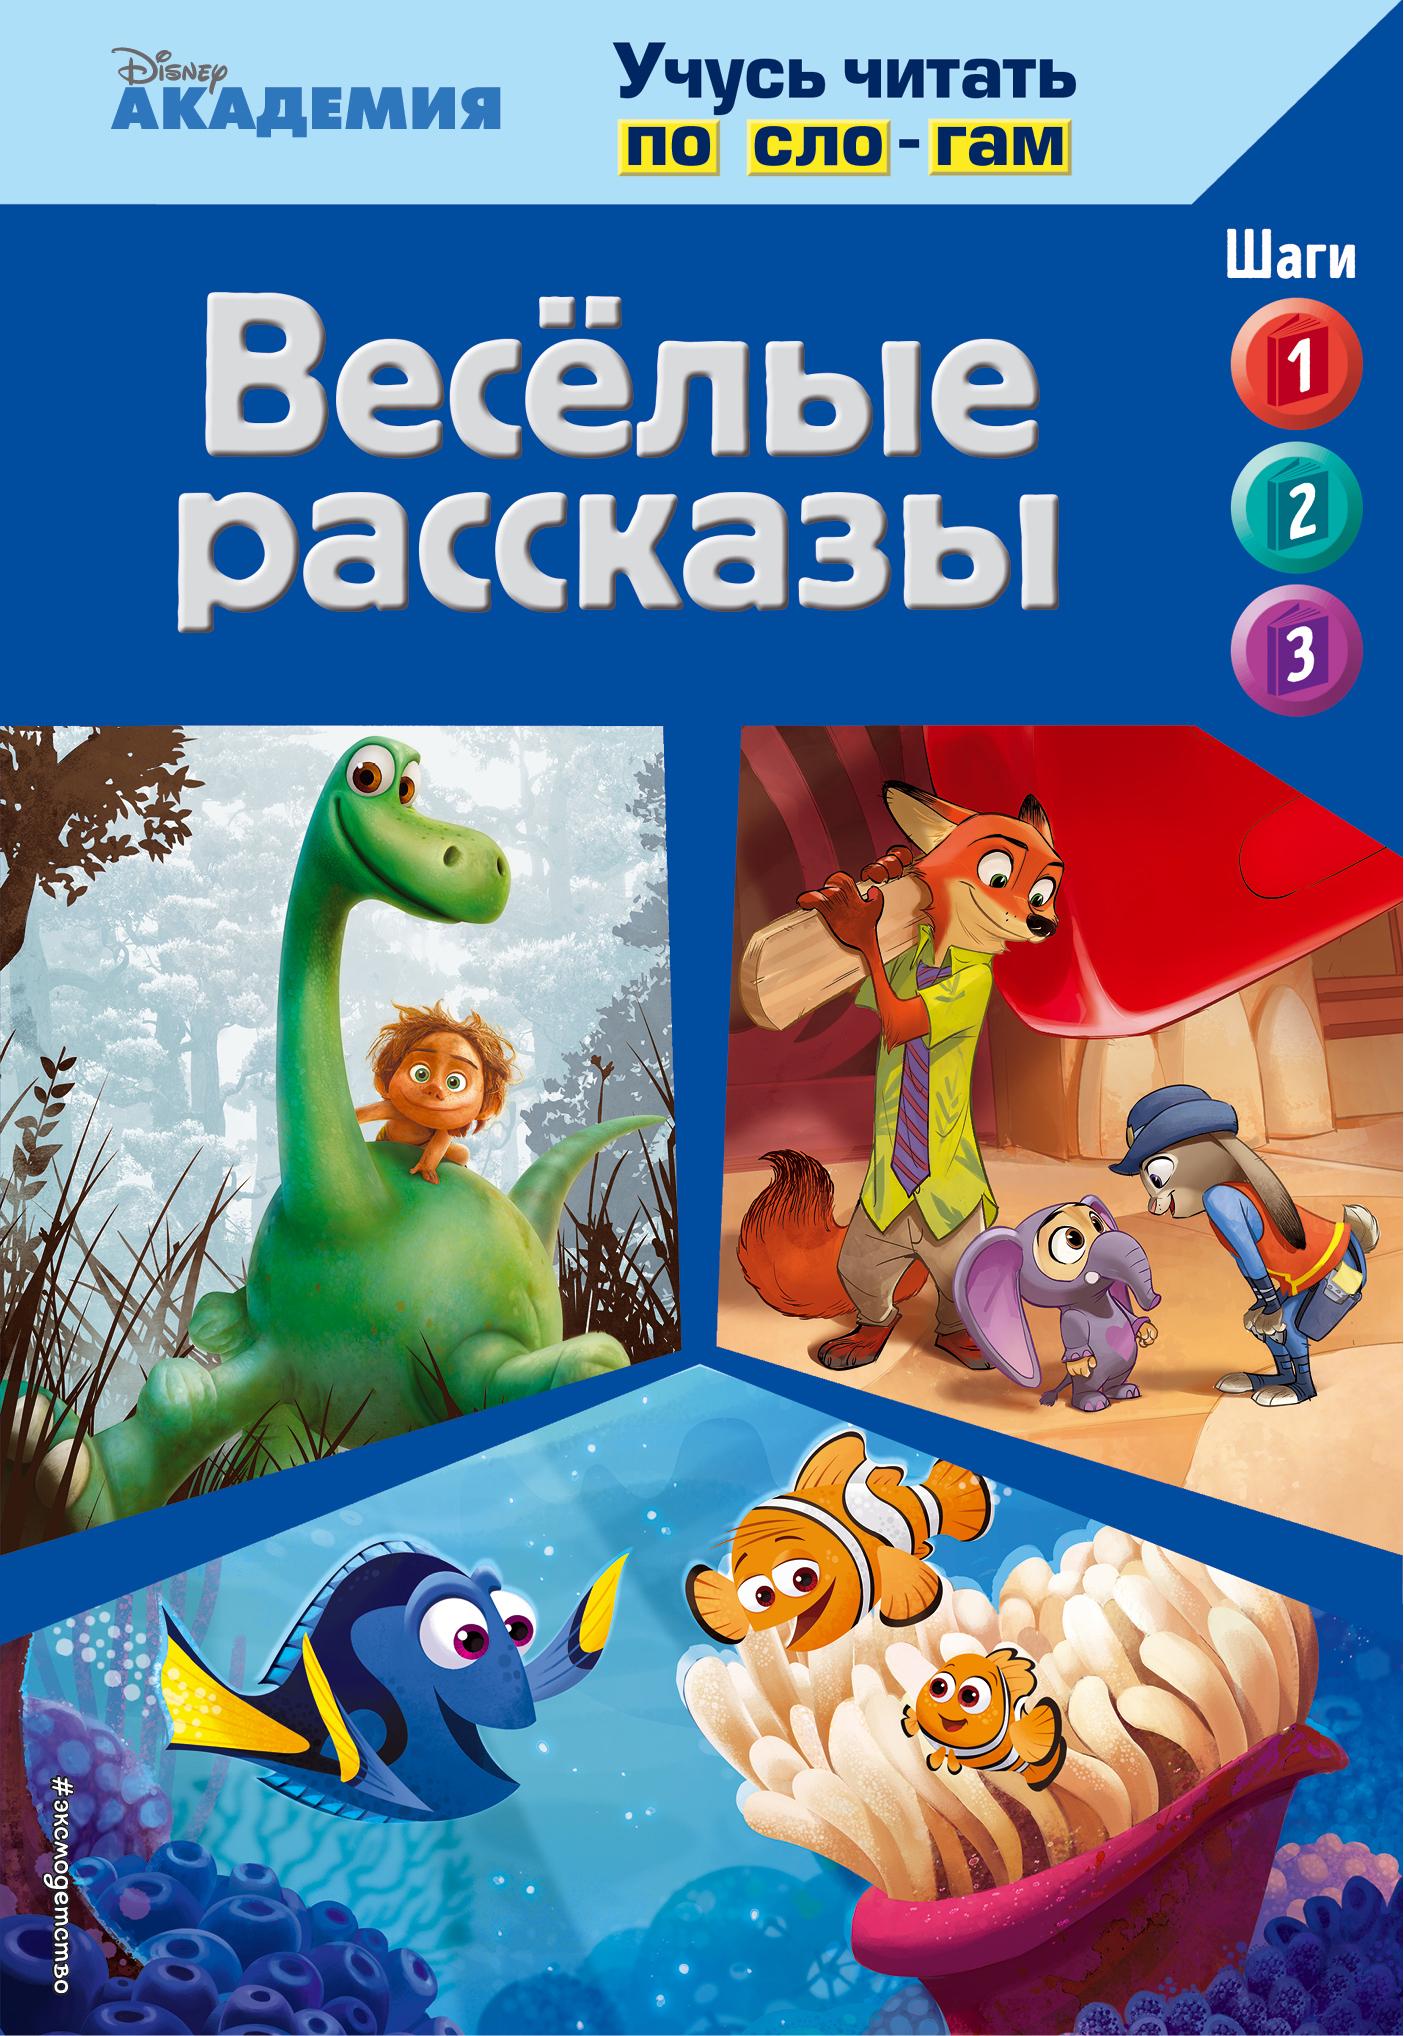 Весёлые рассказы (The Good Dinosaur, Finding Dory, Zootopia) игрушка good dinosaur 62006